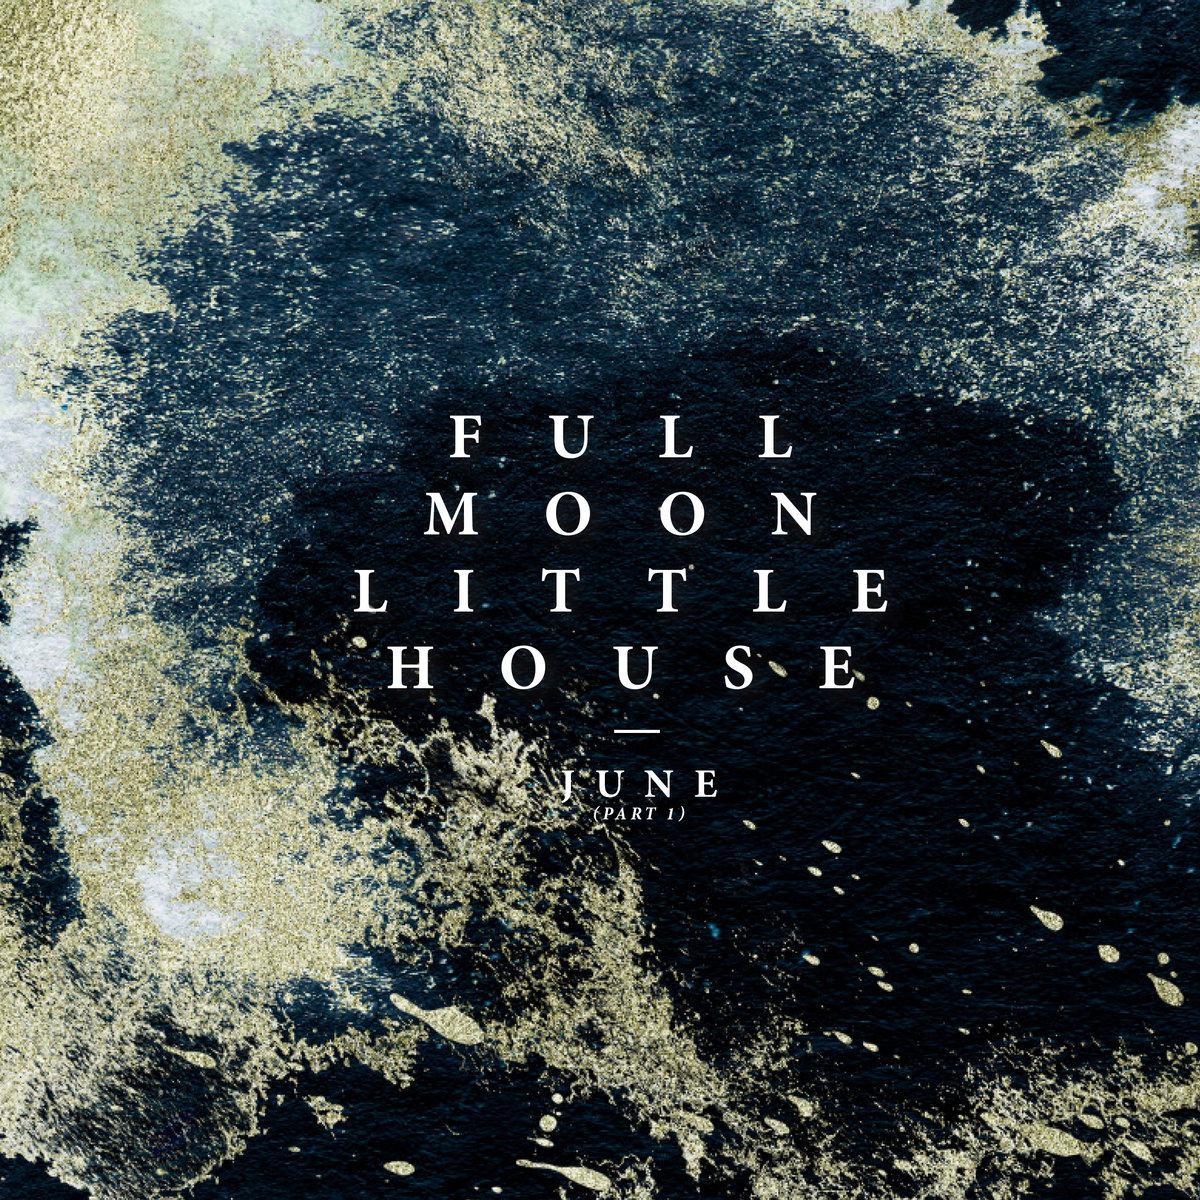 Full Moon Little House (Indie Rock),